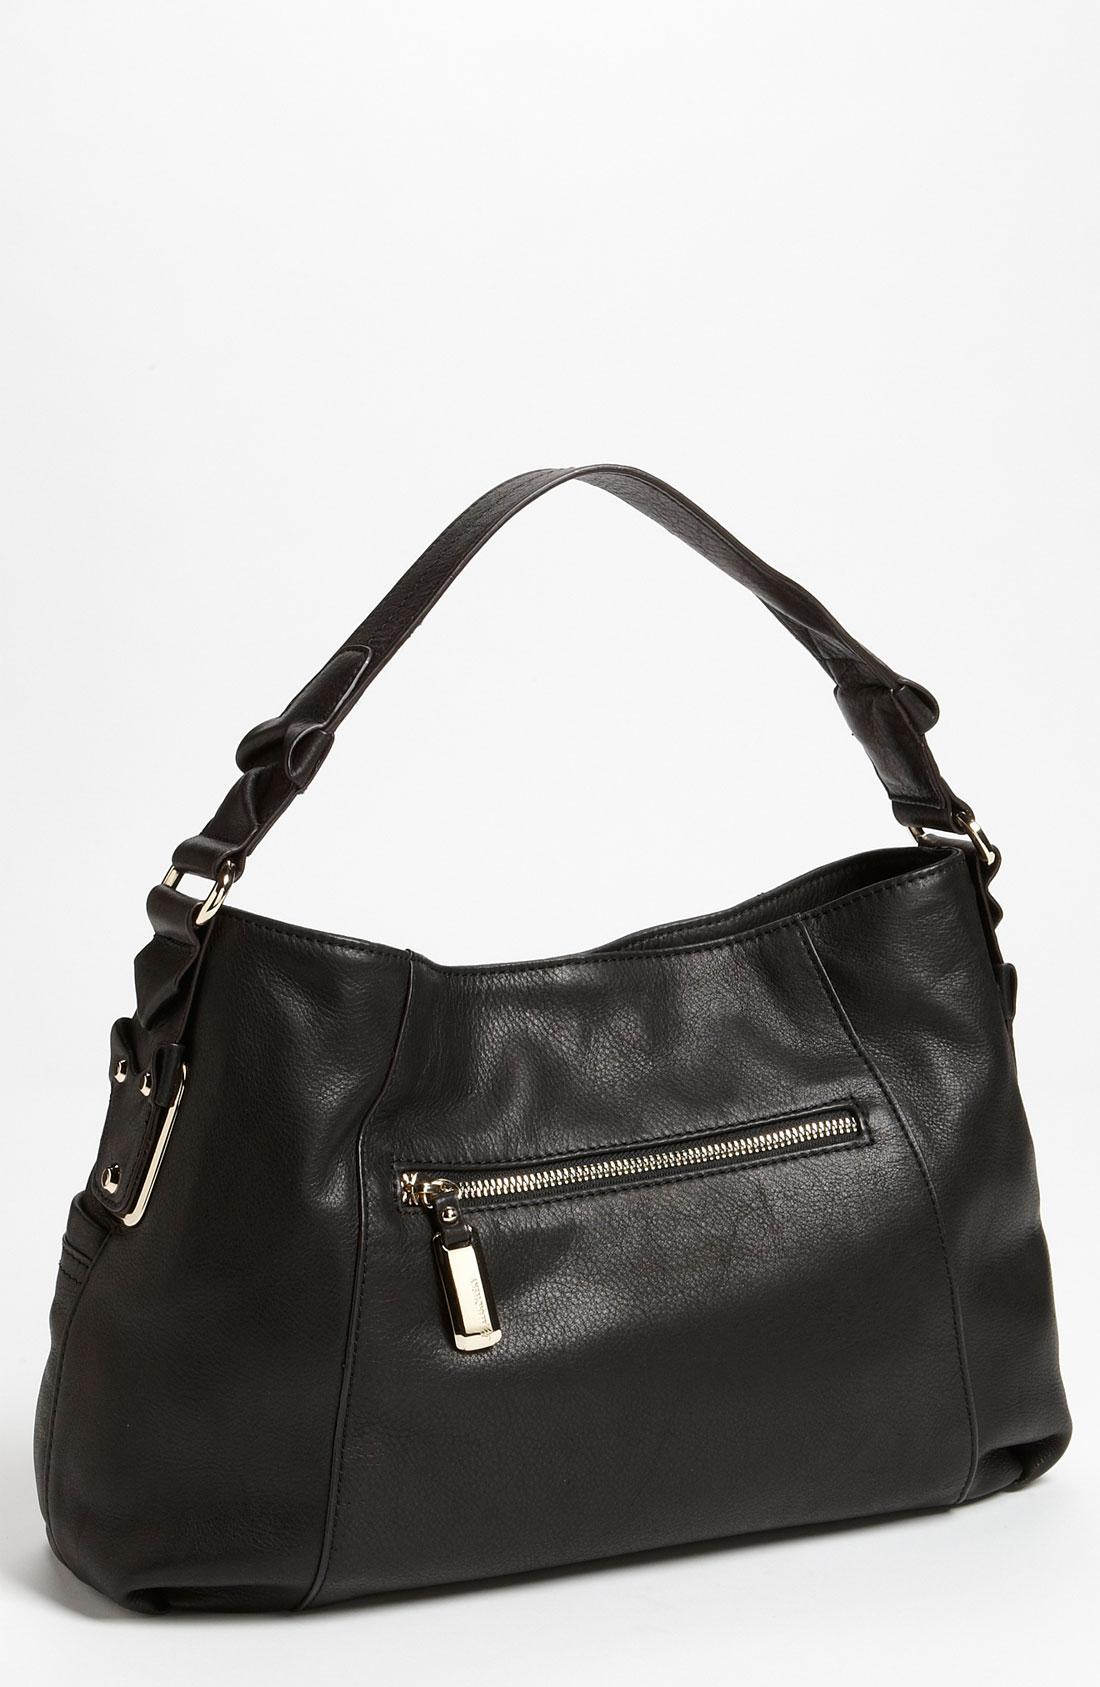 7a0a59cb4dc Makowsky Handbags Nordstrom B Sale